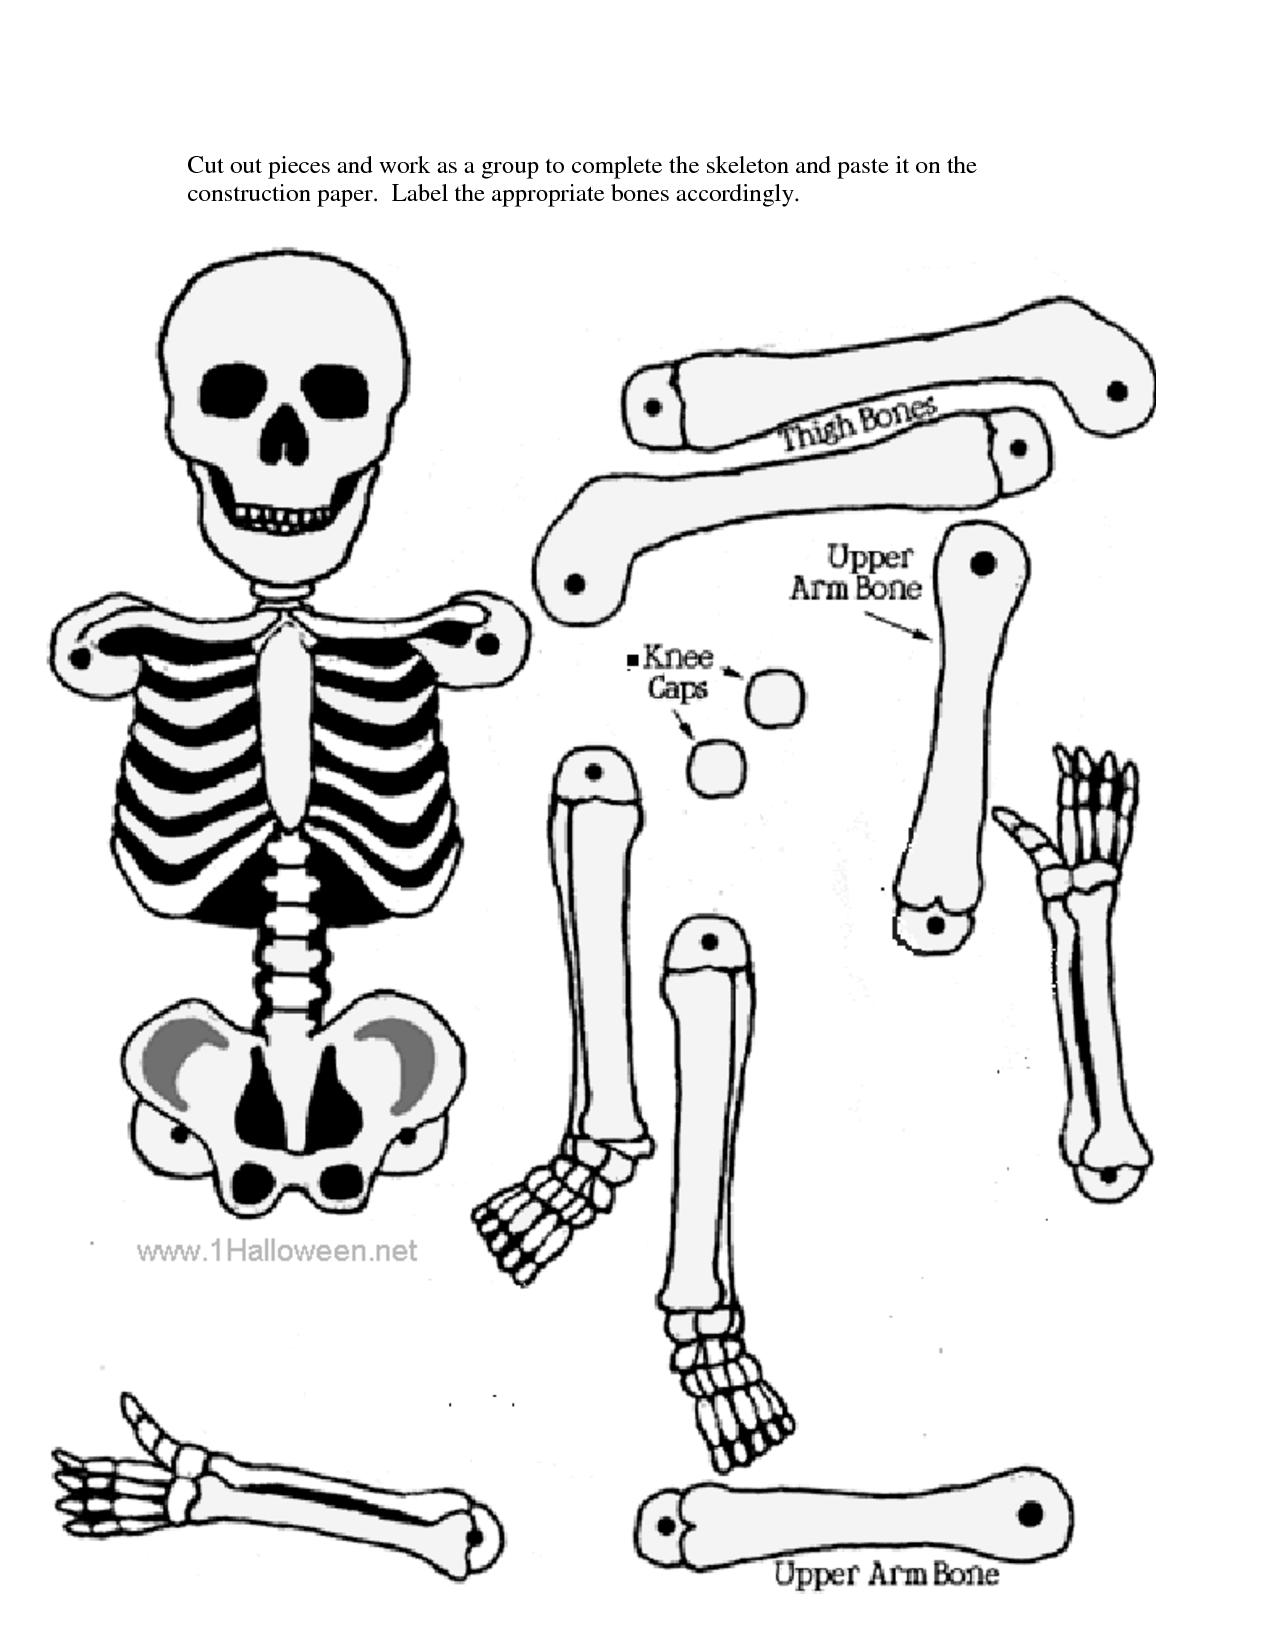 Anatomy Games - Real Bodywork